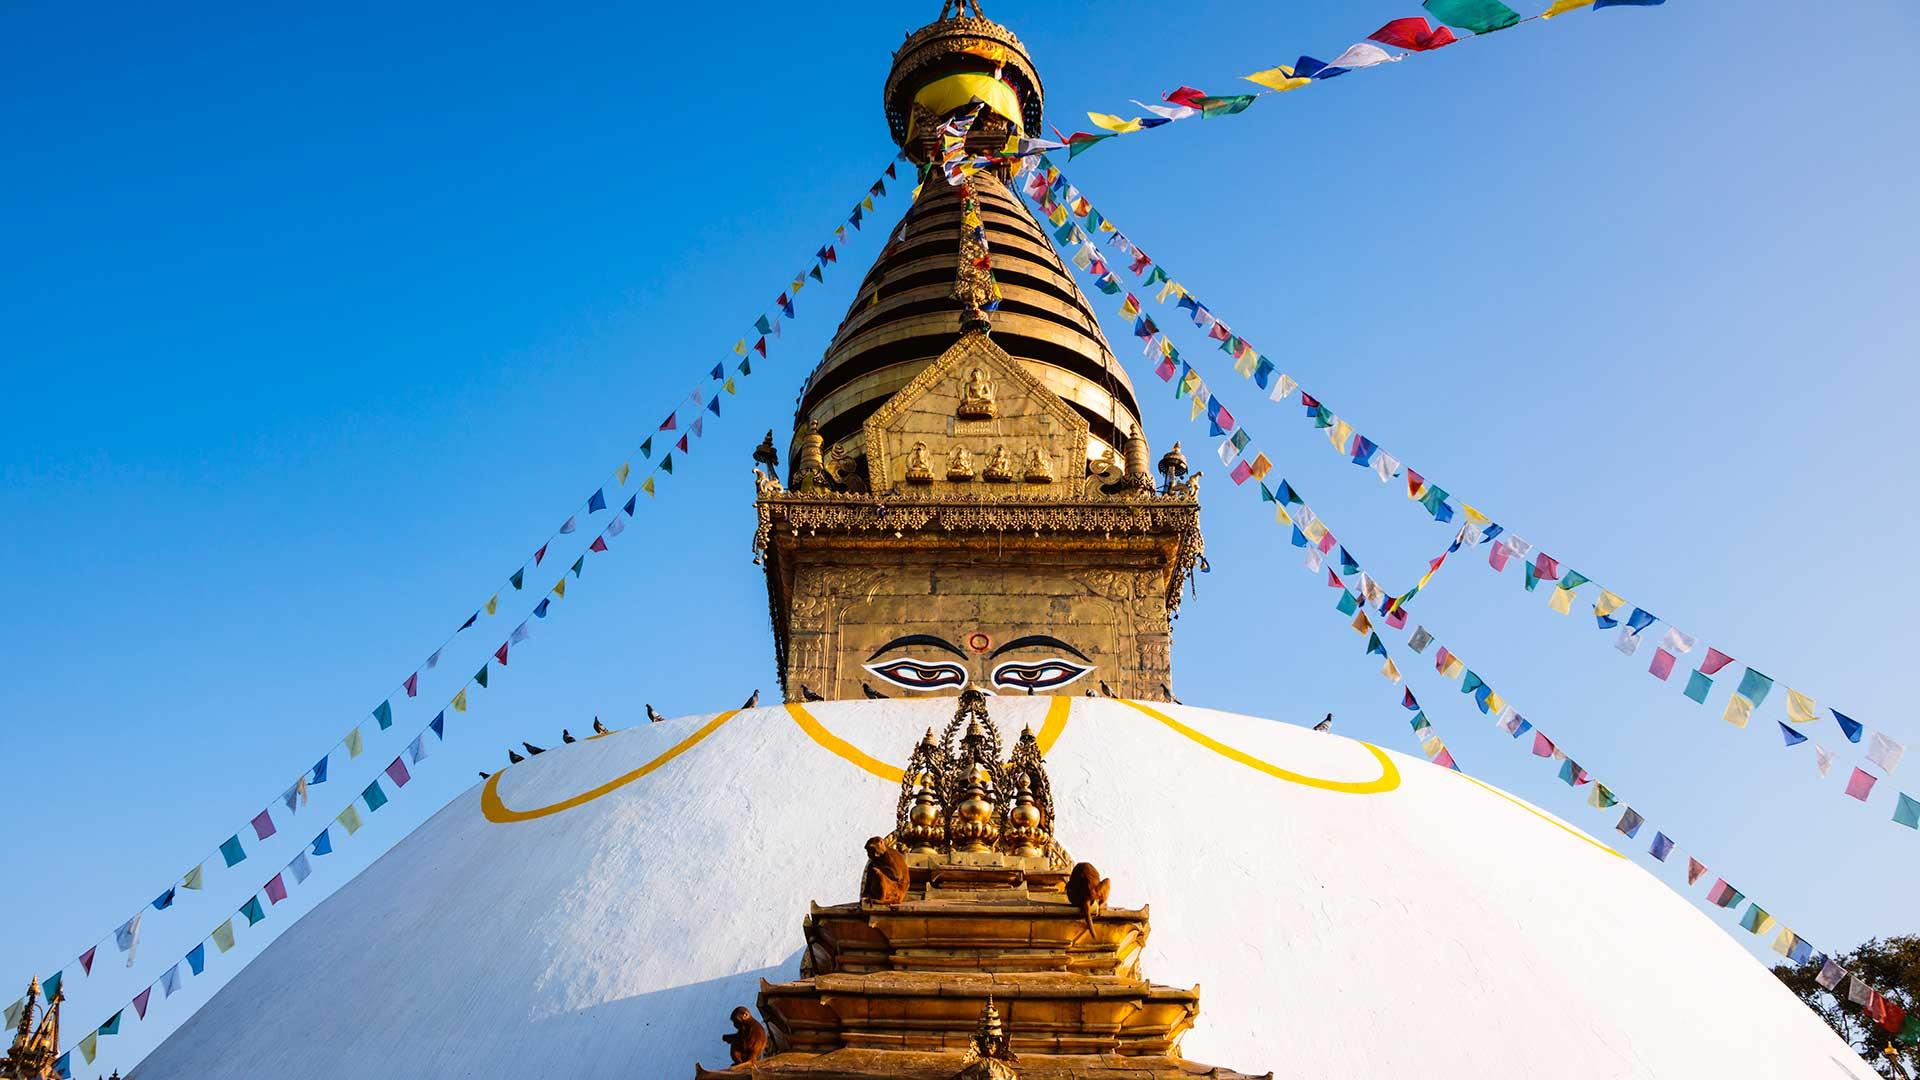 Sunrise at Swayambhunath Temple in Kathmandu, Nepal